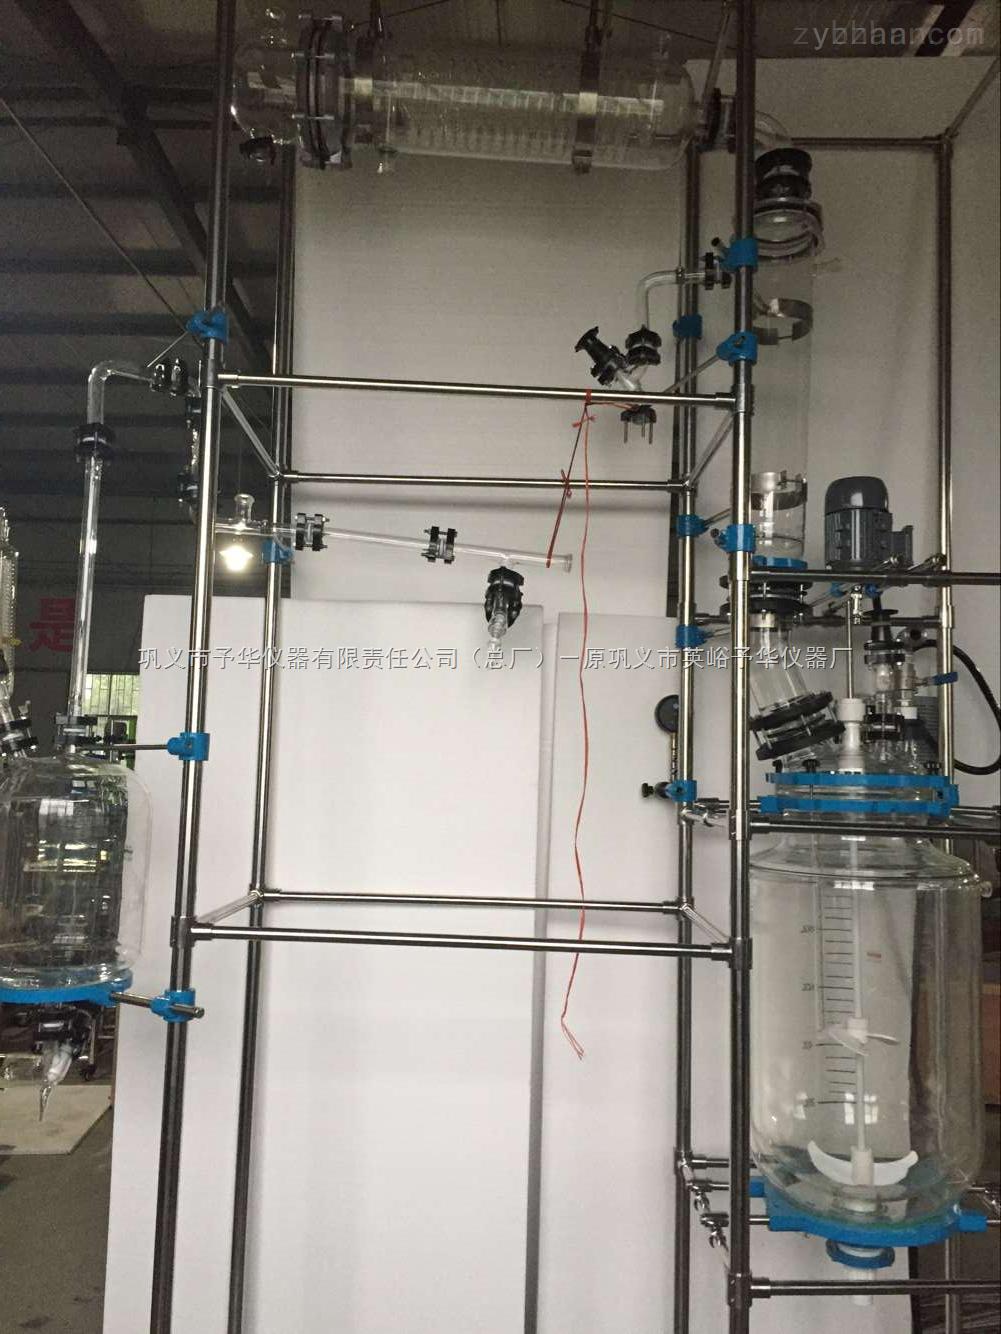 10L双层玻璃精馏反应釜,巩义予华厂可定做各种精馏釜